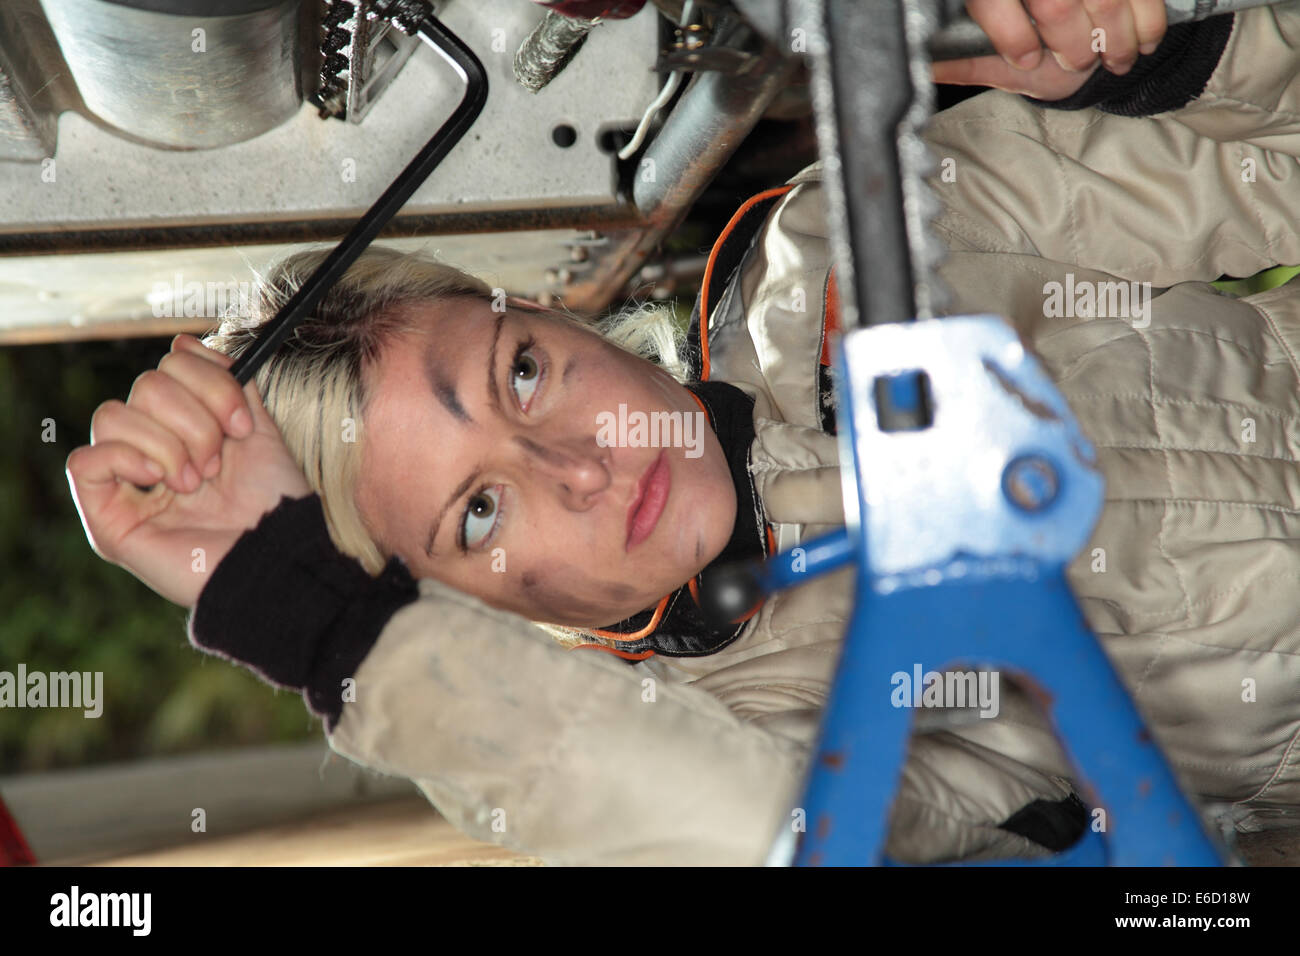 Woman fixing her midget race car - Stock Image